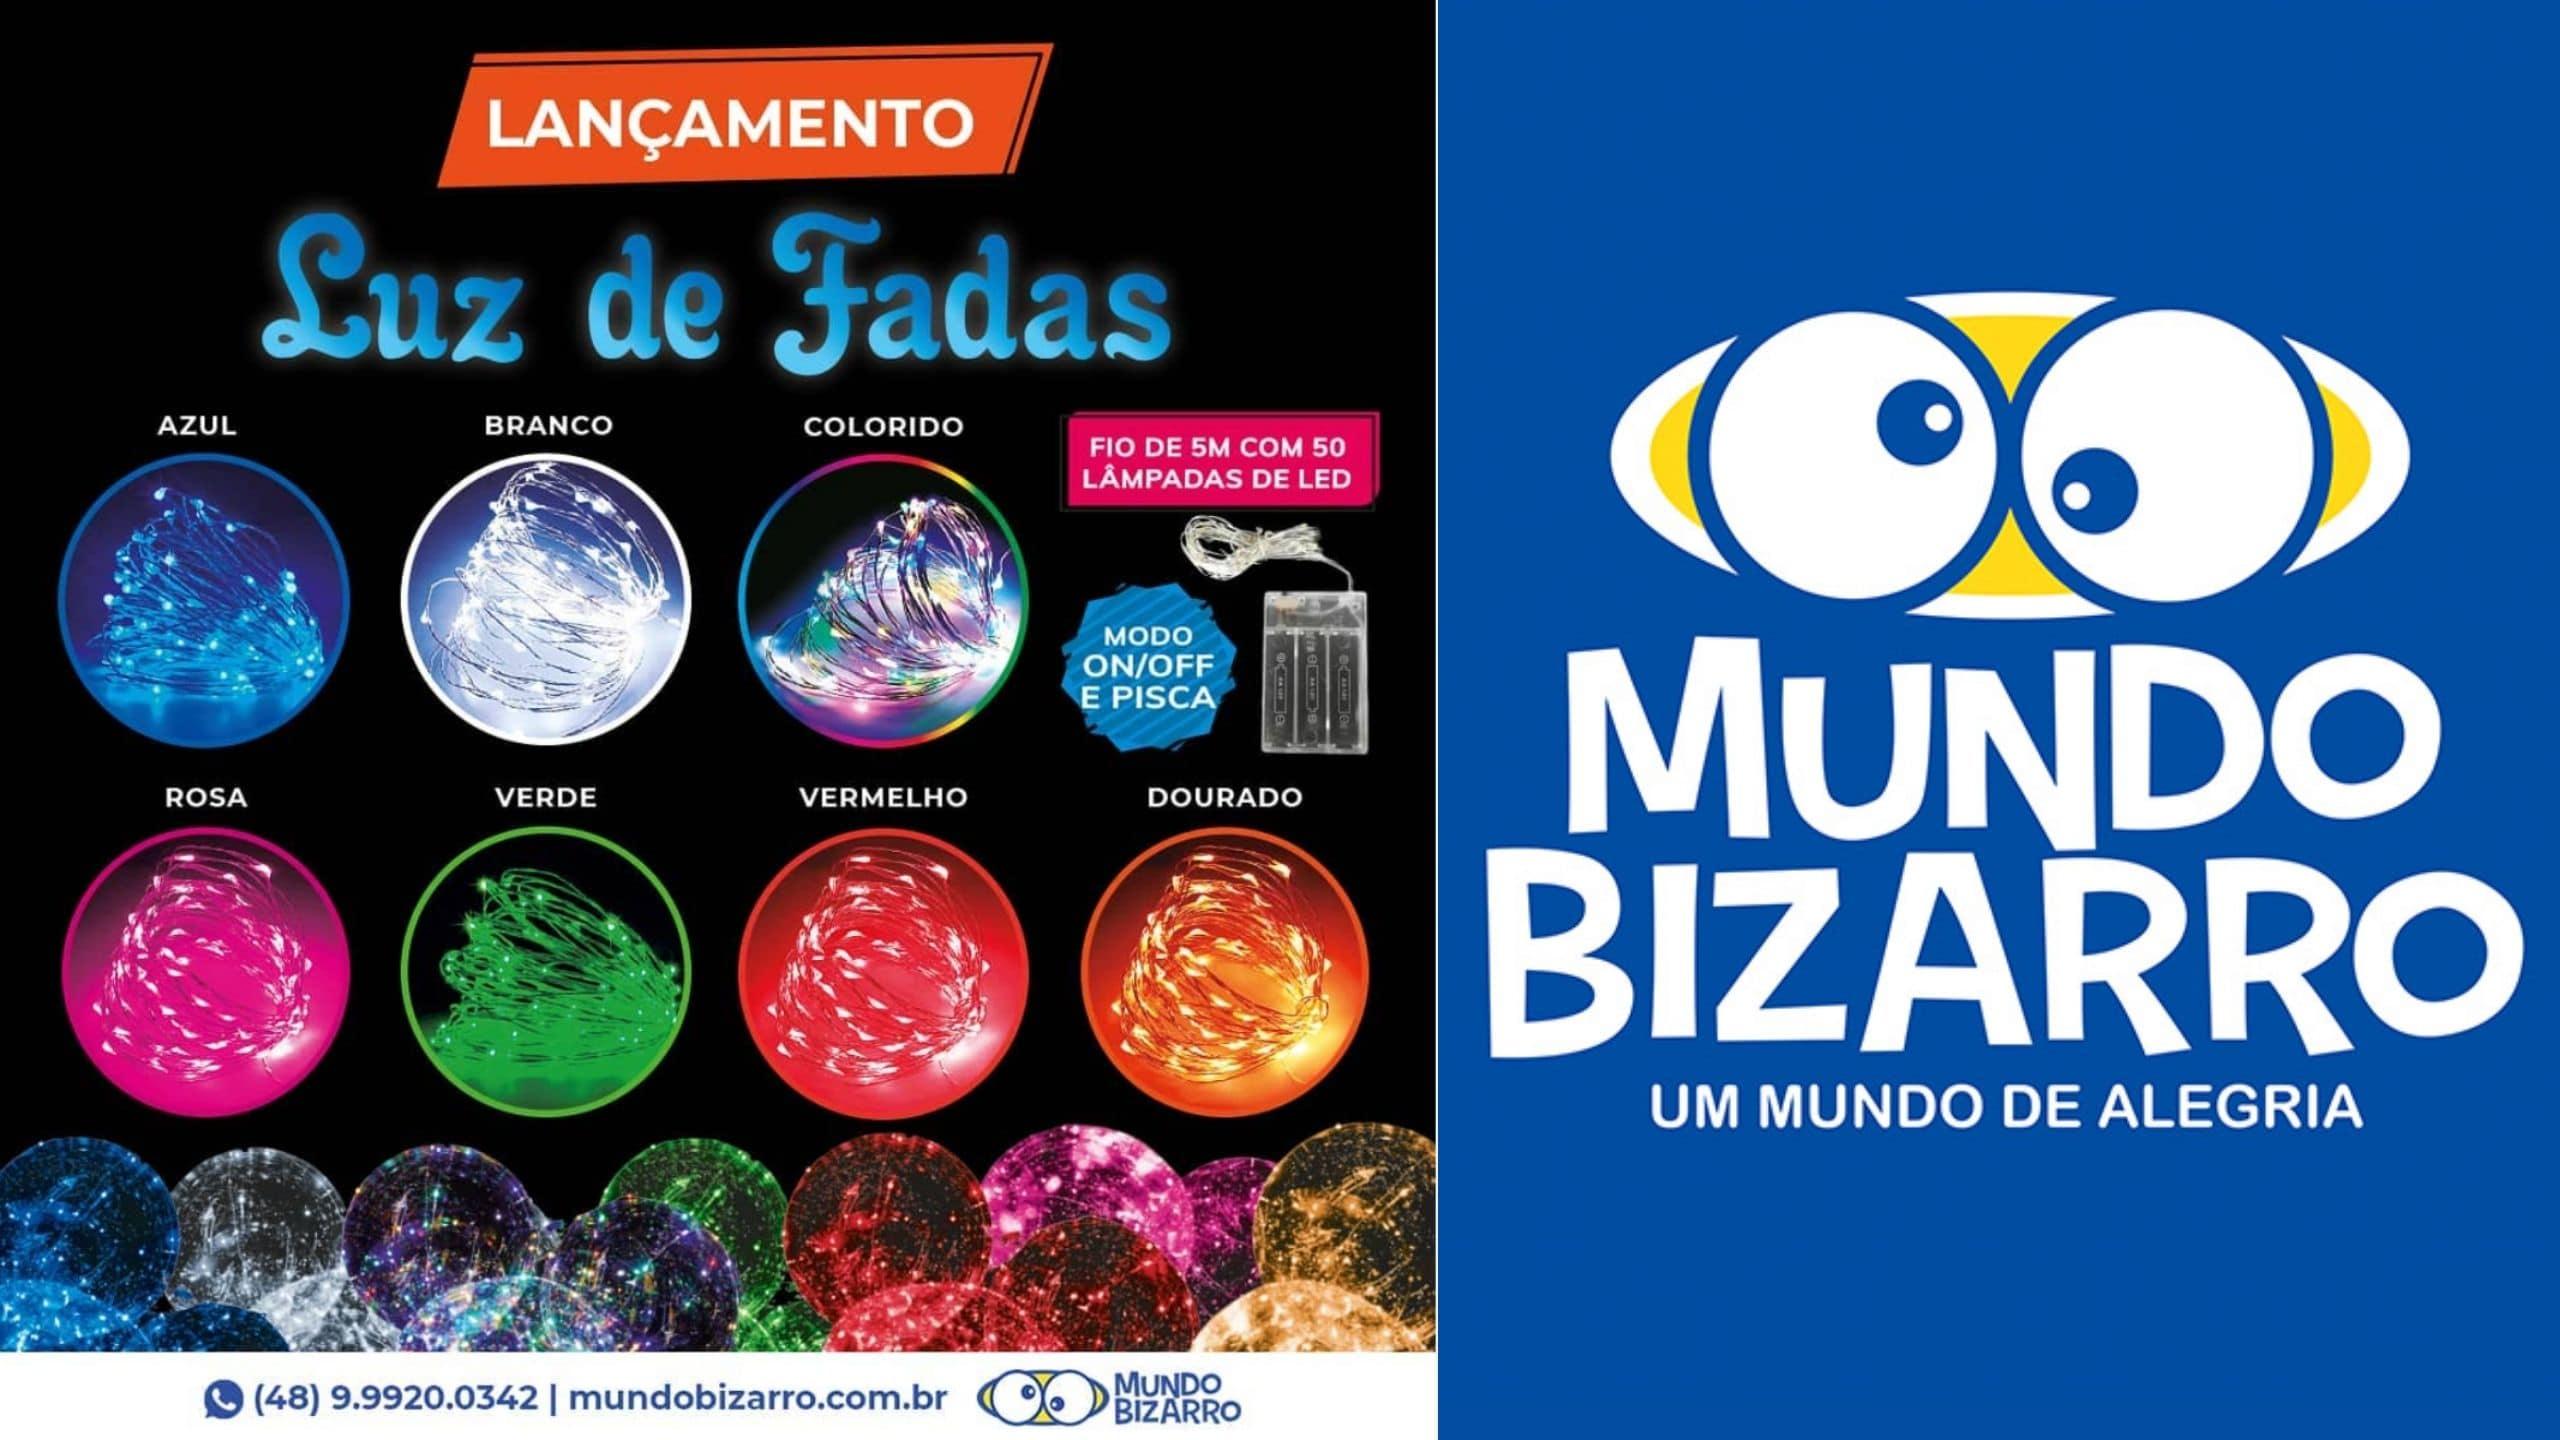 Luz de fadas (luz de LED/ Fio de LED) para usar com Bubble Mundo Bizarro